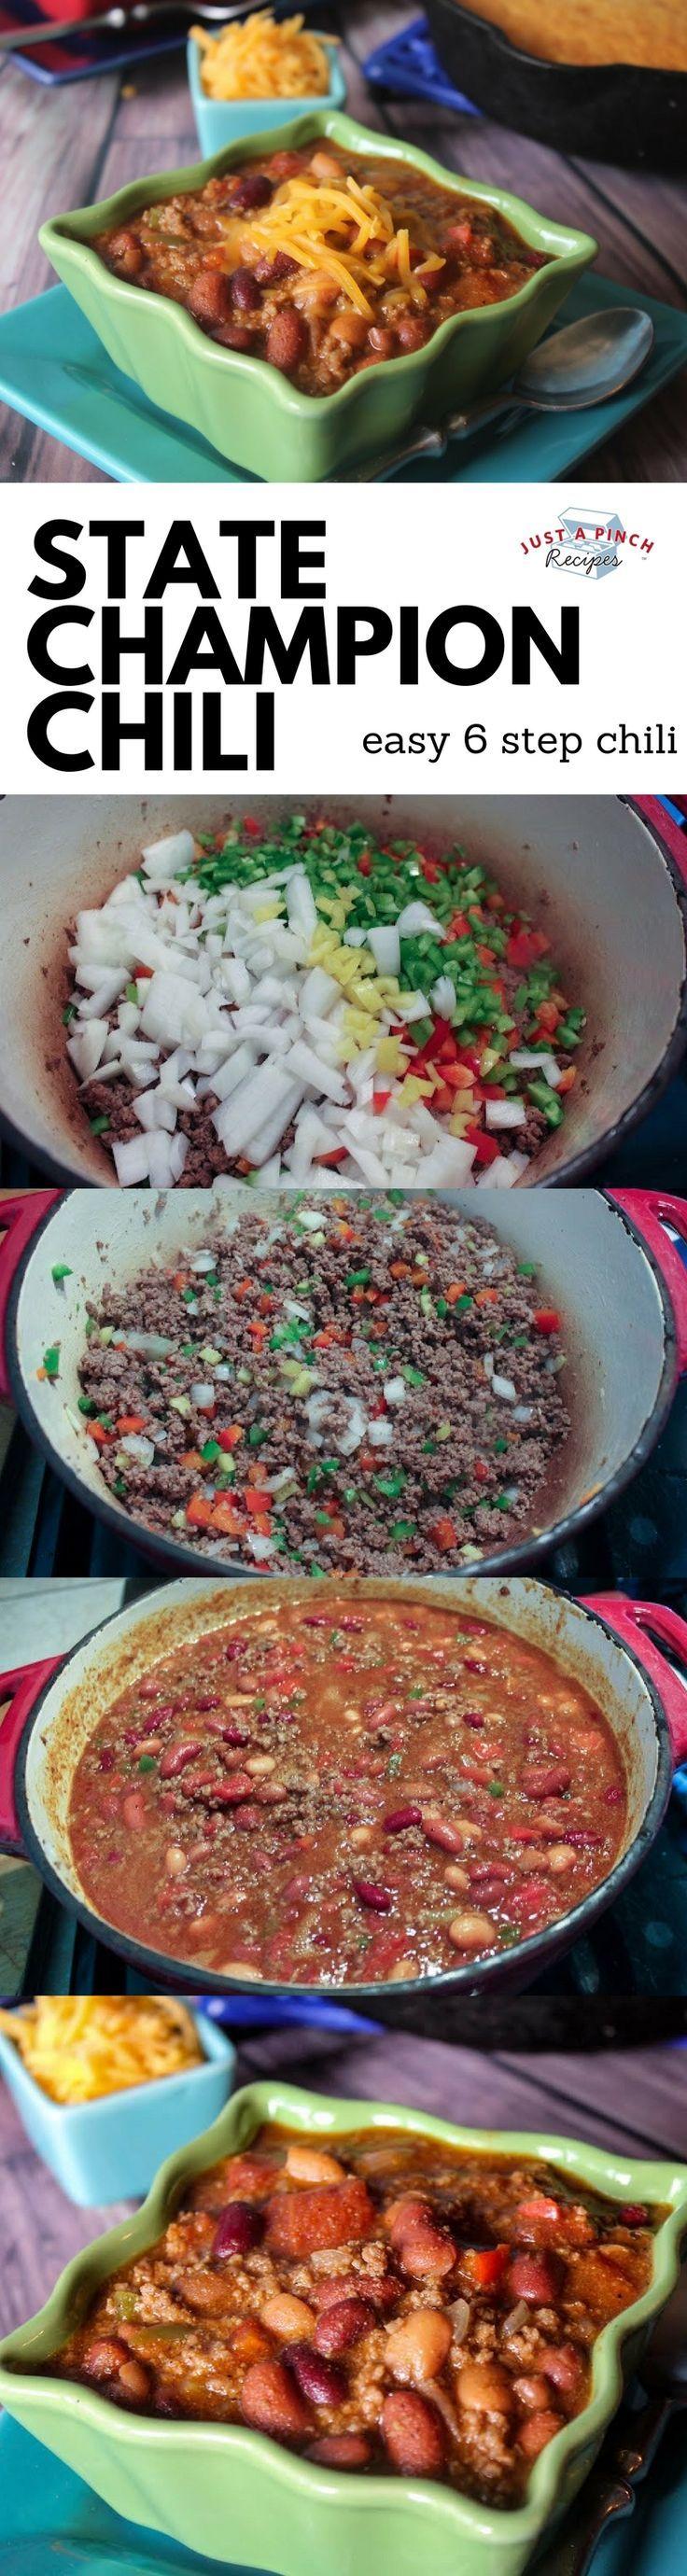 State Champion Chili Made Easy Recipe Best Chili Recipe Best Chili Recipe Ever Recipes